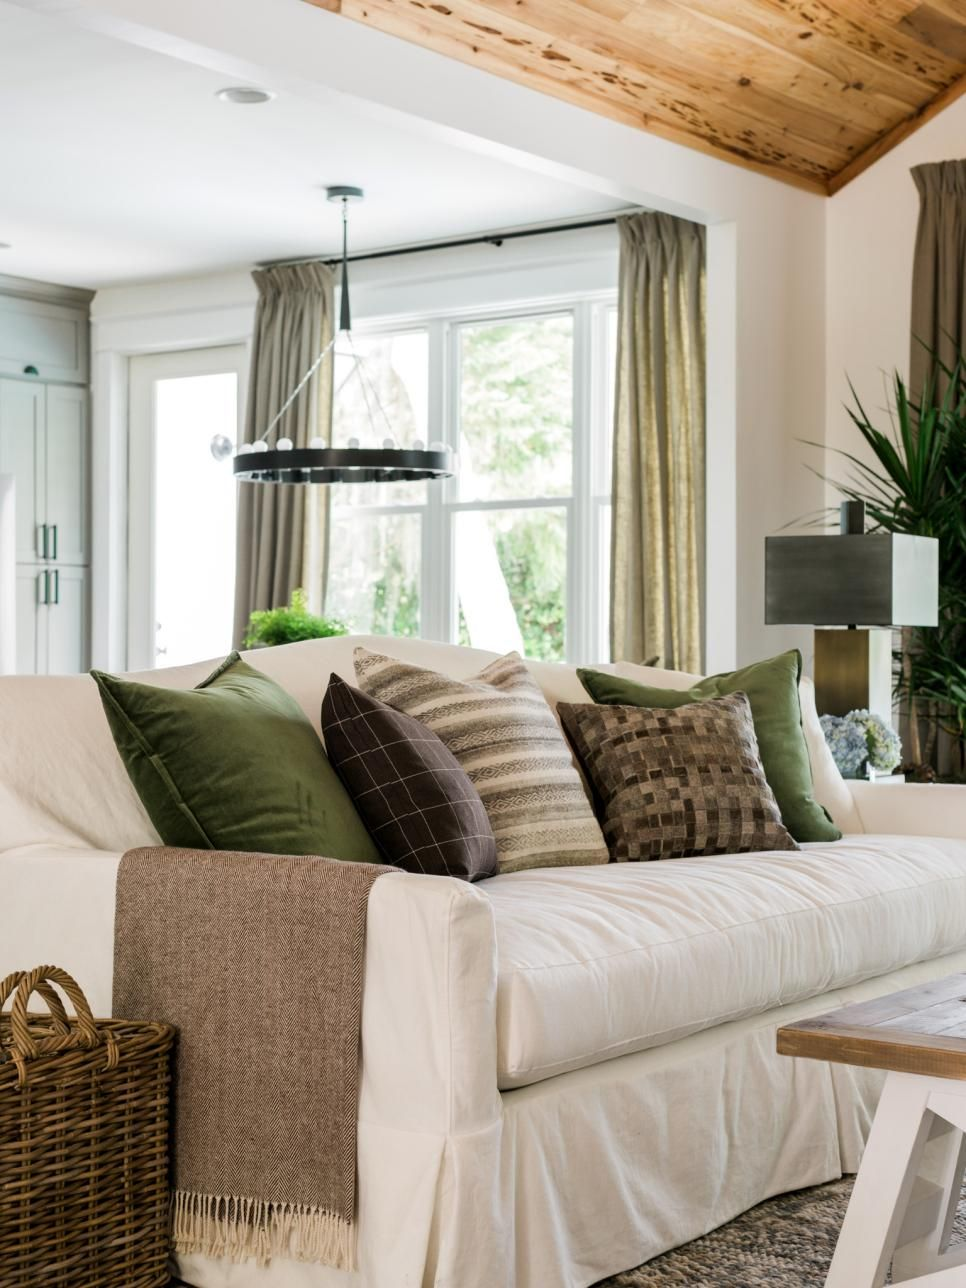 Hgtv Designs For Living Room Unique Dream Home 2017 Living Room Pictures  Living Room Pictures Room Design Decoration